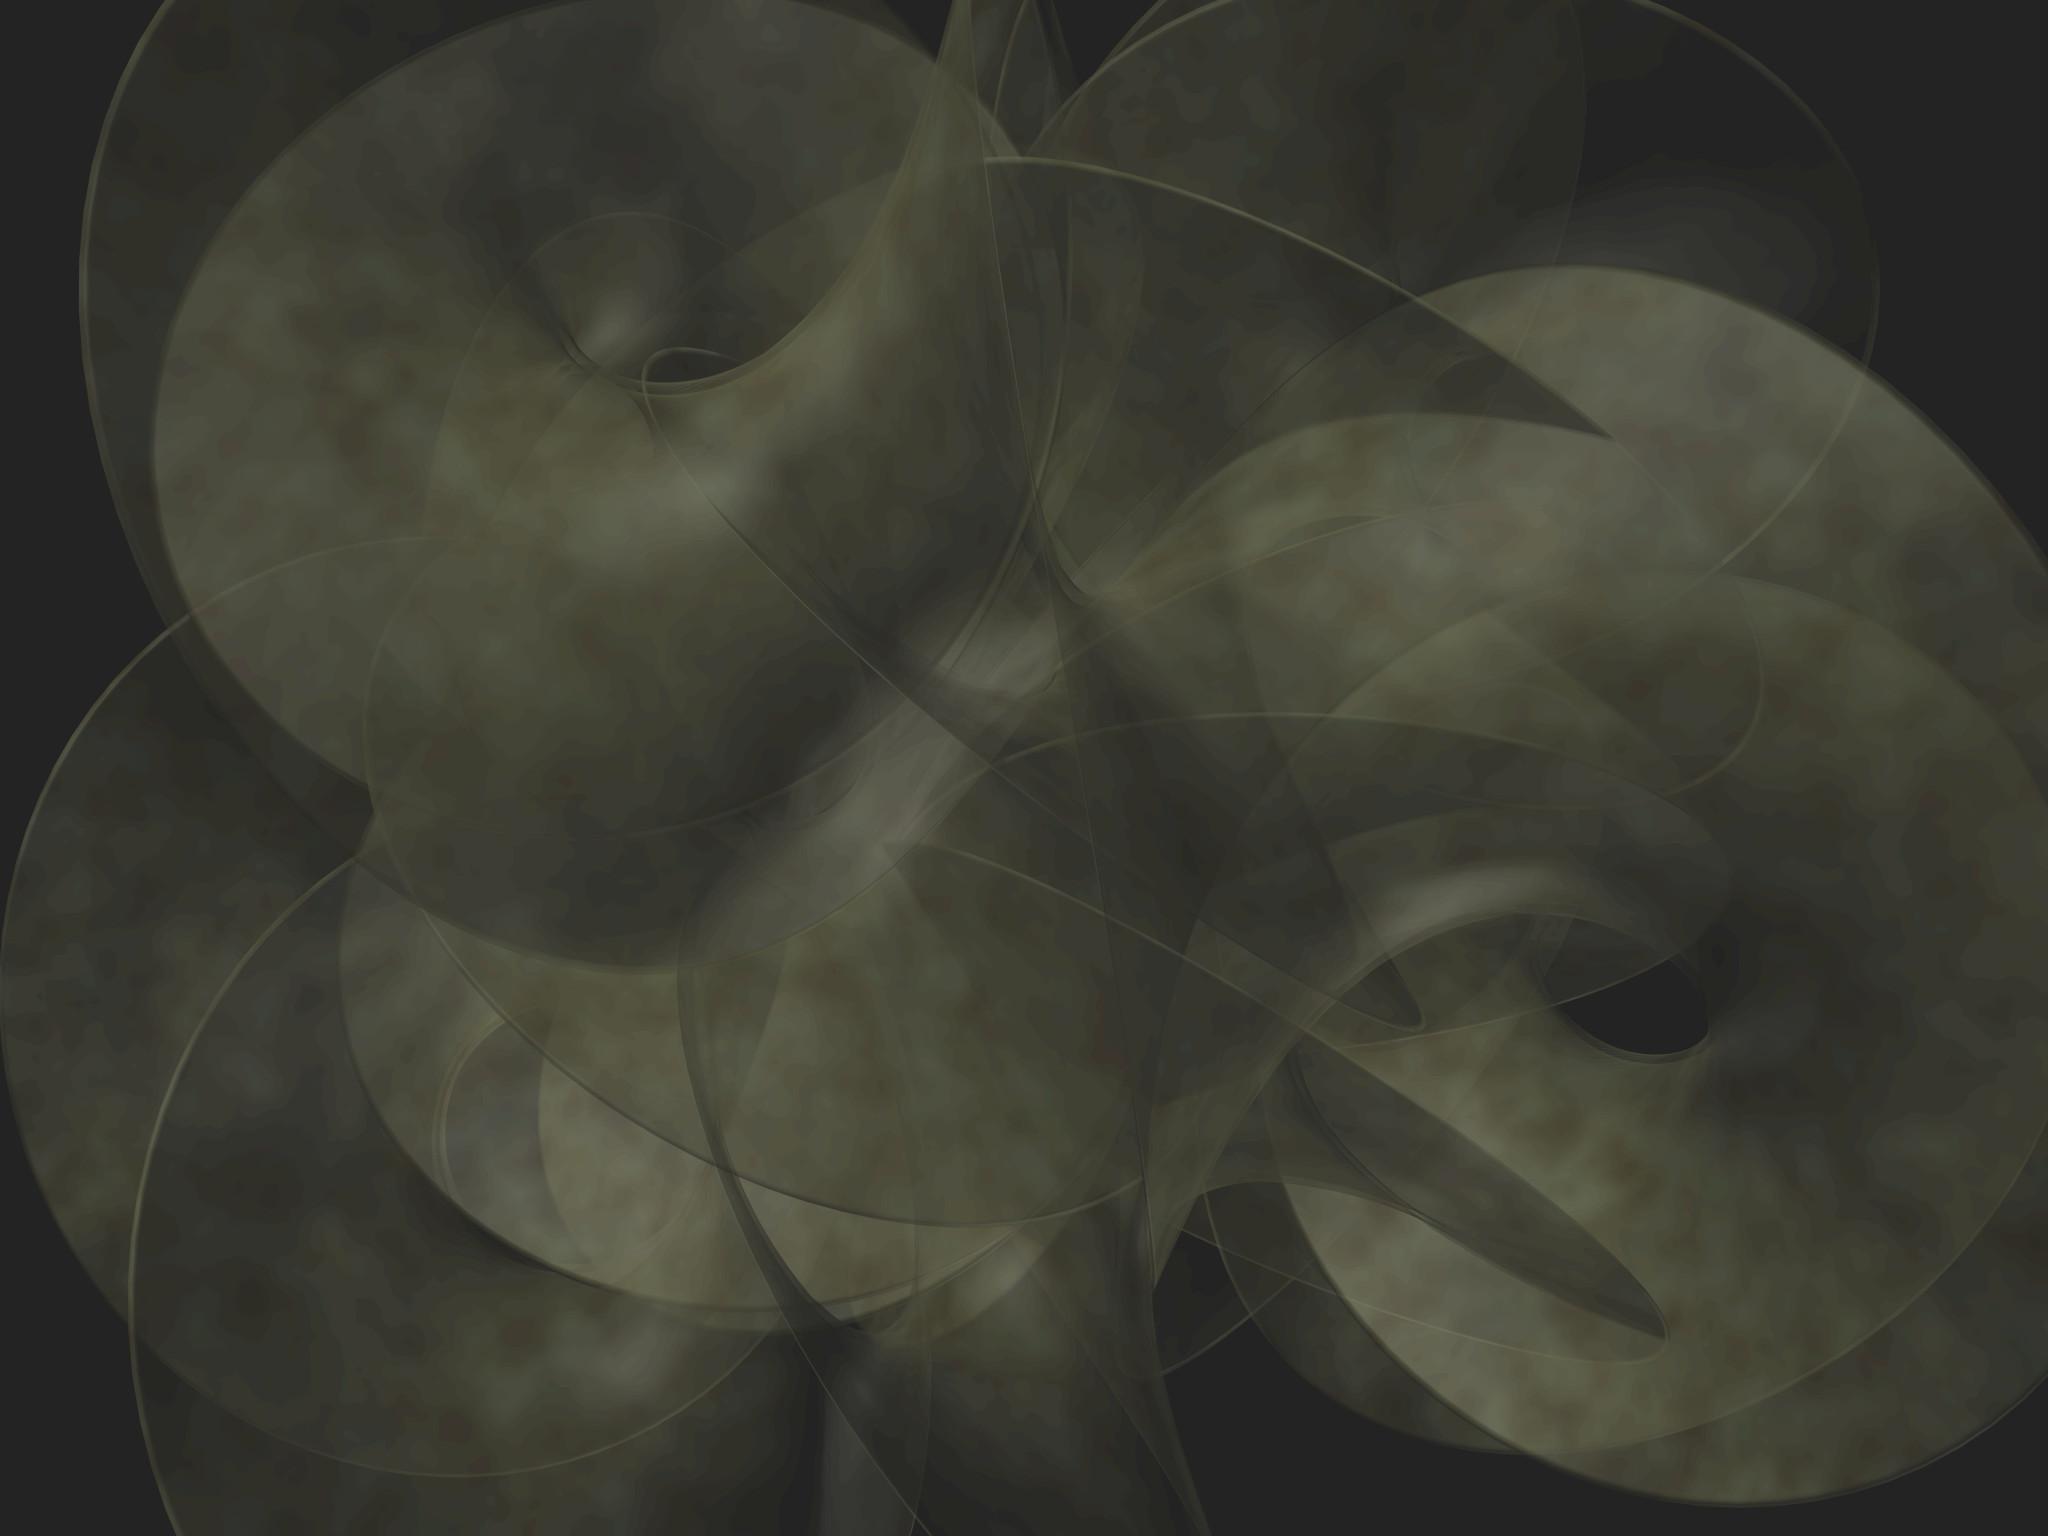 Res: 2048x1536, Download Yggdrasil 1 [PNG, , 566Kb]